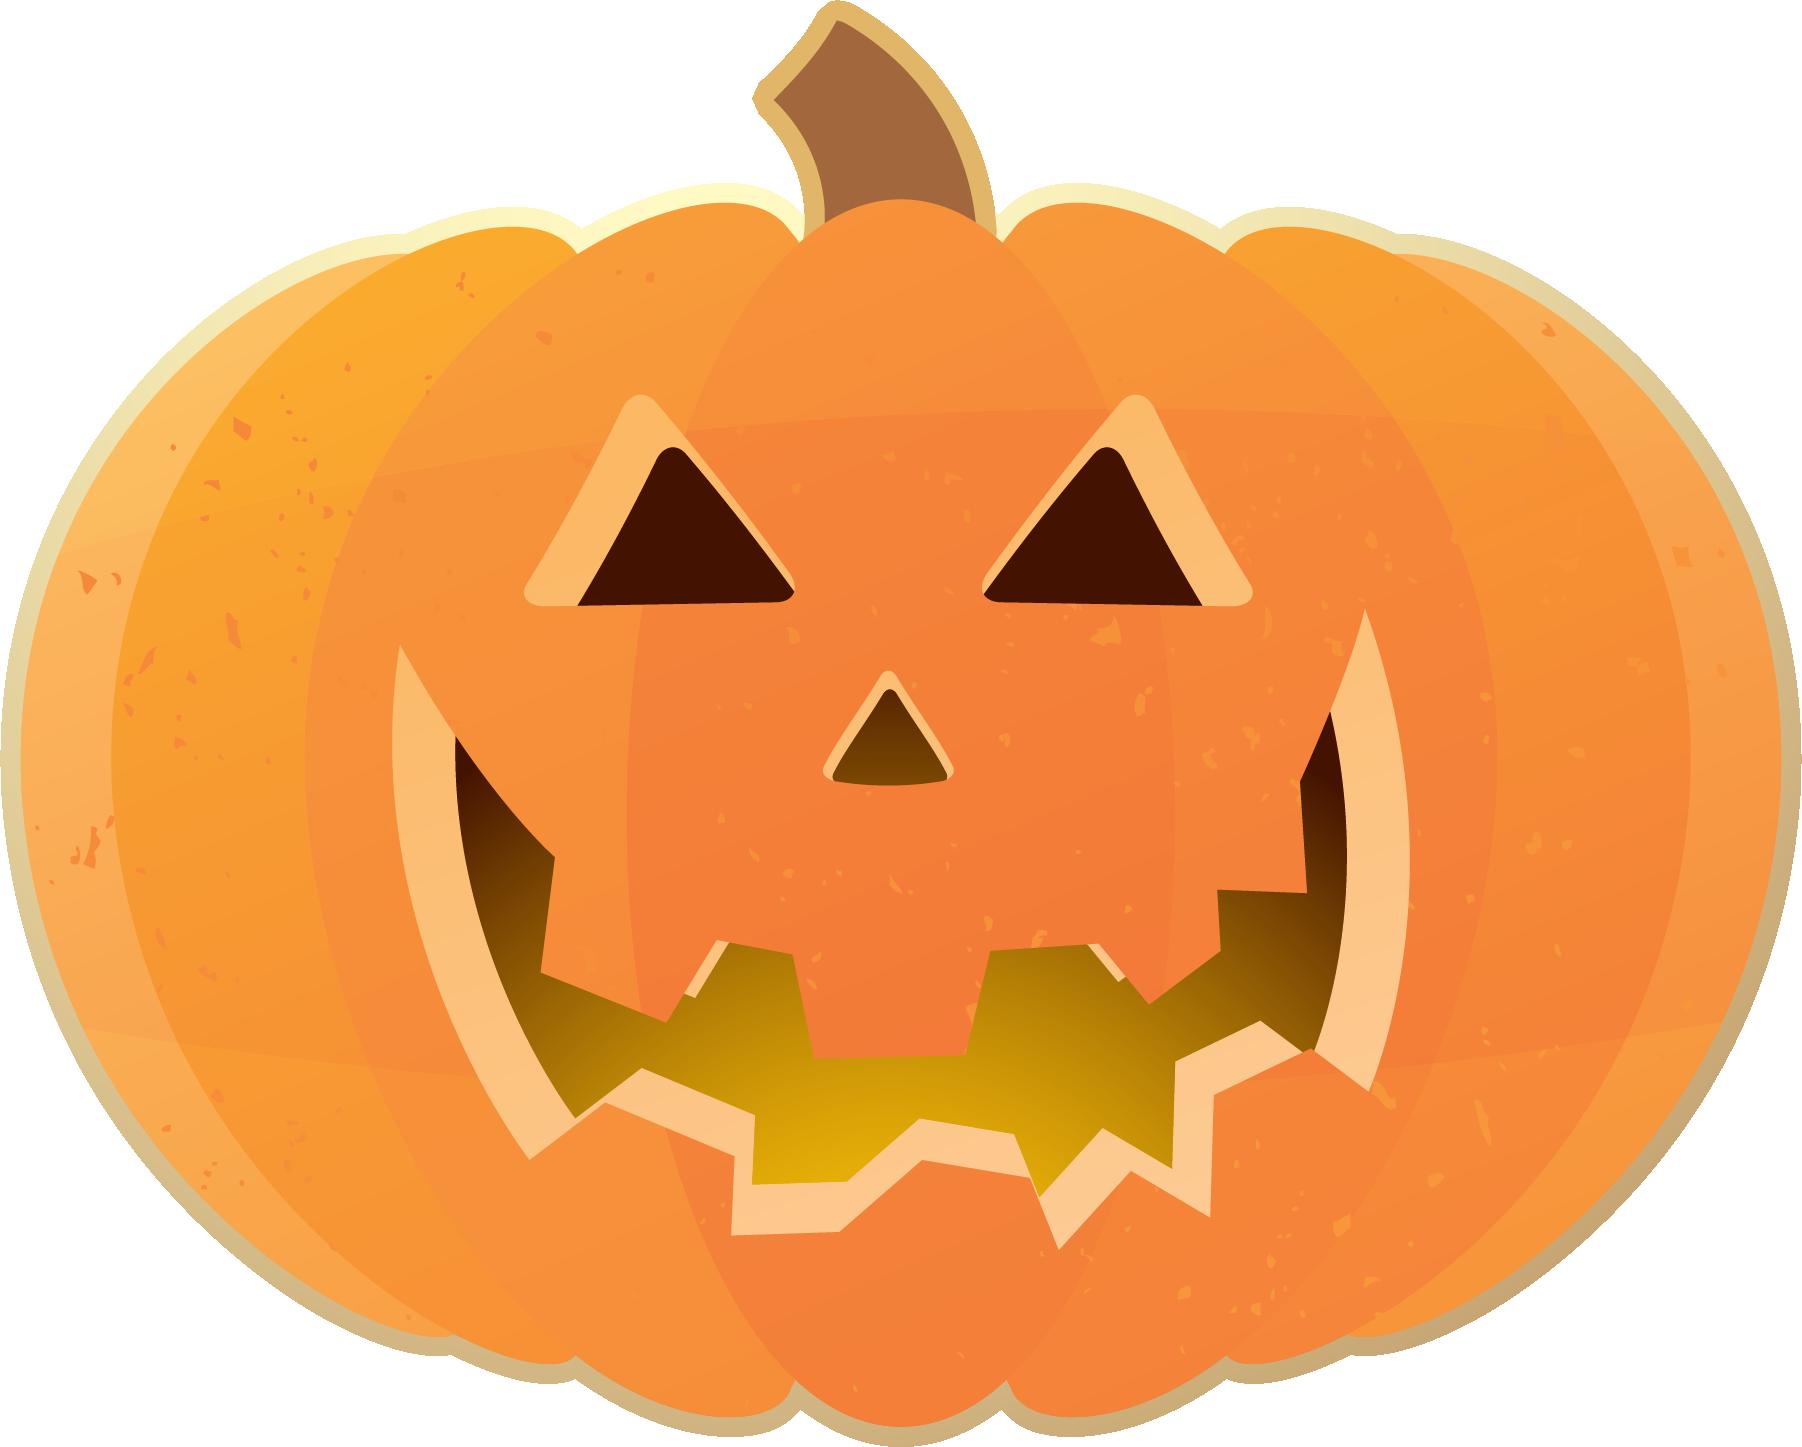 Love Pumpkin Carving Pumpkin Carvings Love it